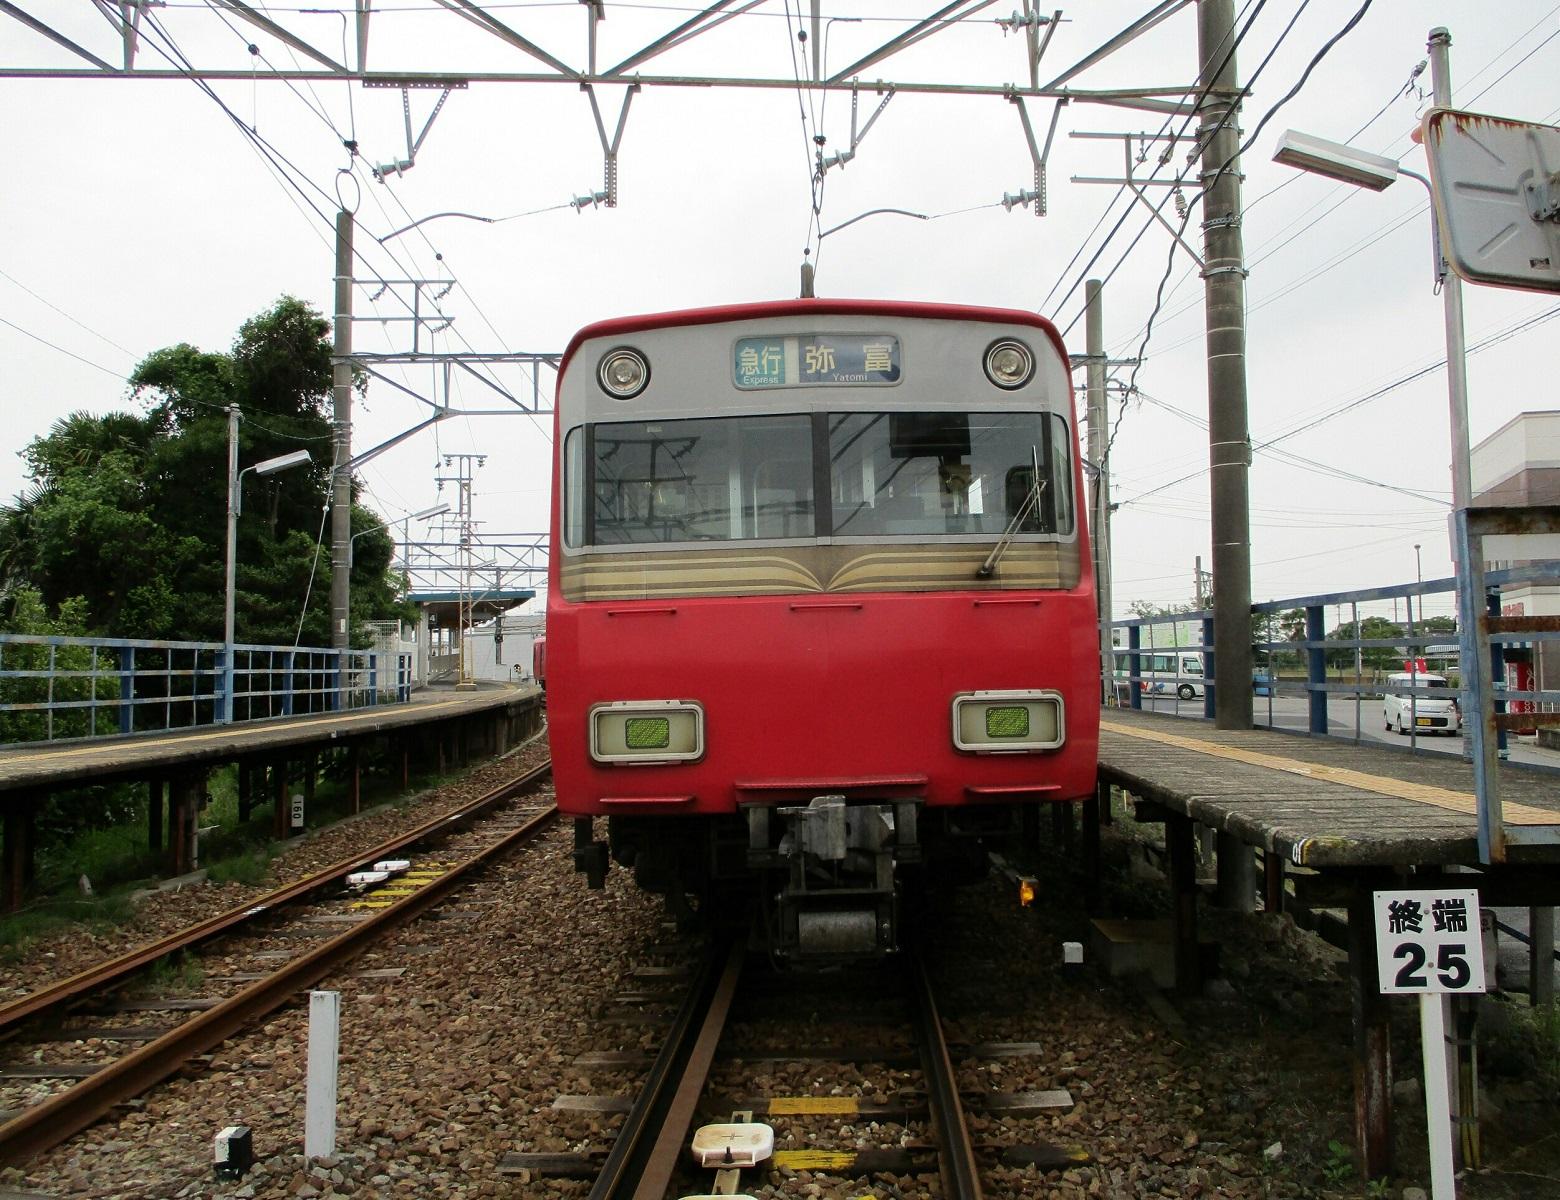 2018.6.15 吉良吉田 (9) 吉良吉田いき急行 1560-1200